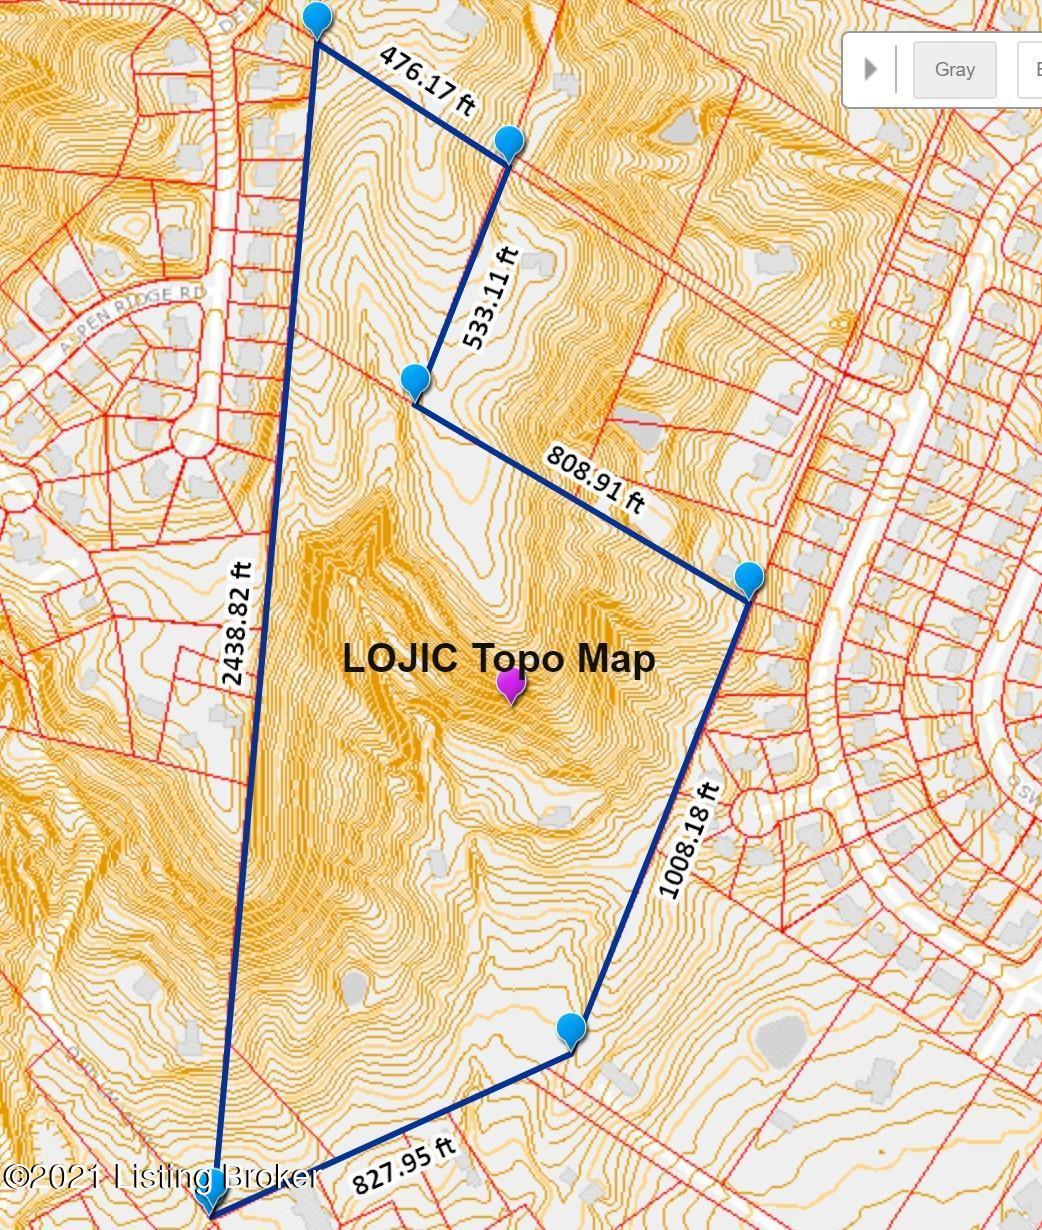 LOJIC Topo Map 7600 St Andrews Ch 210519